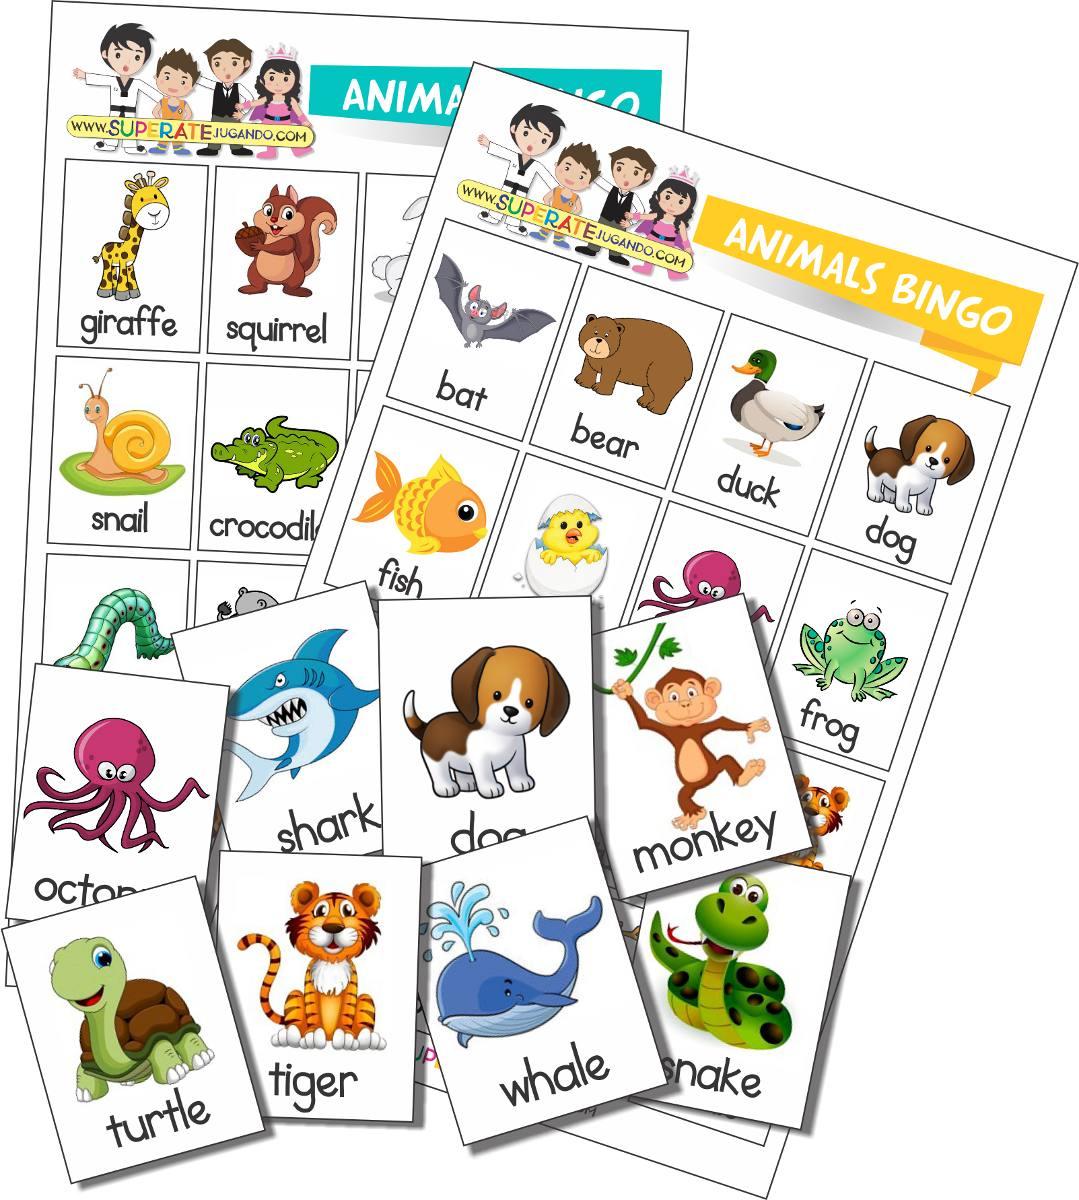 Loteria Para Imprimir Animales En Ingles Aprender Ingles